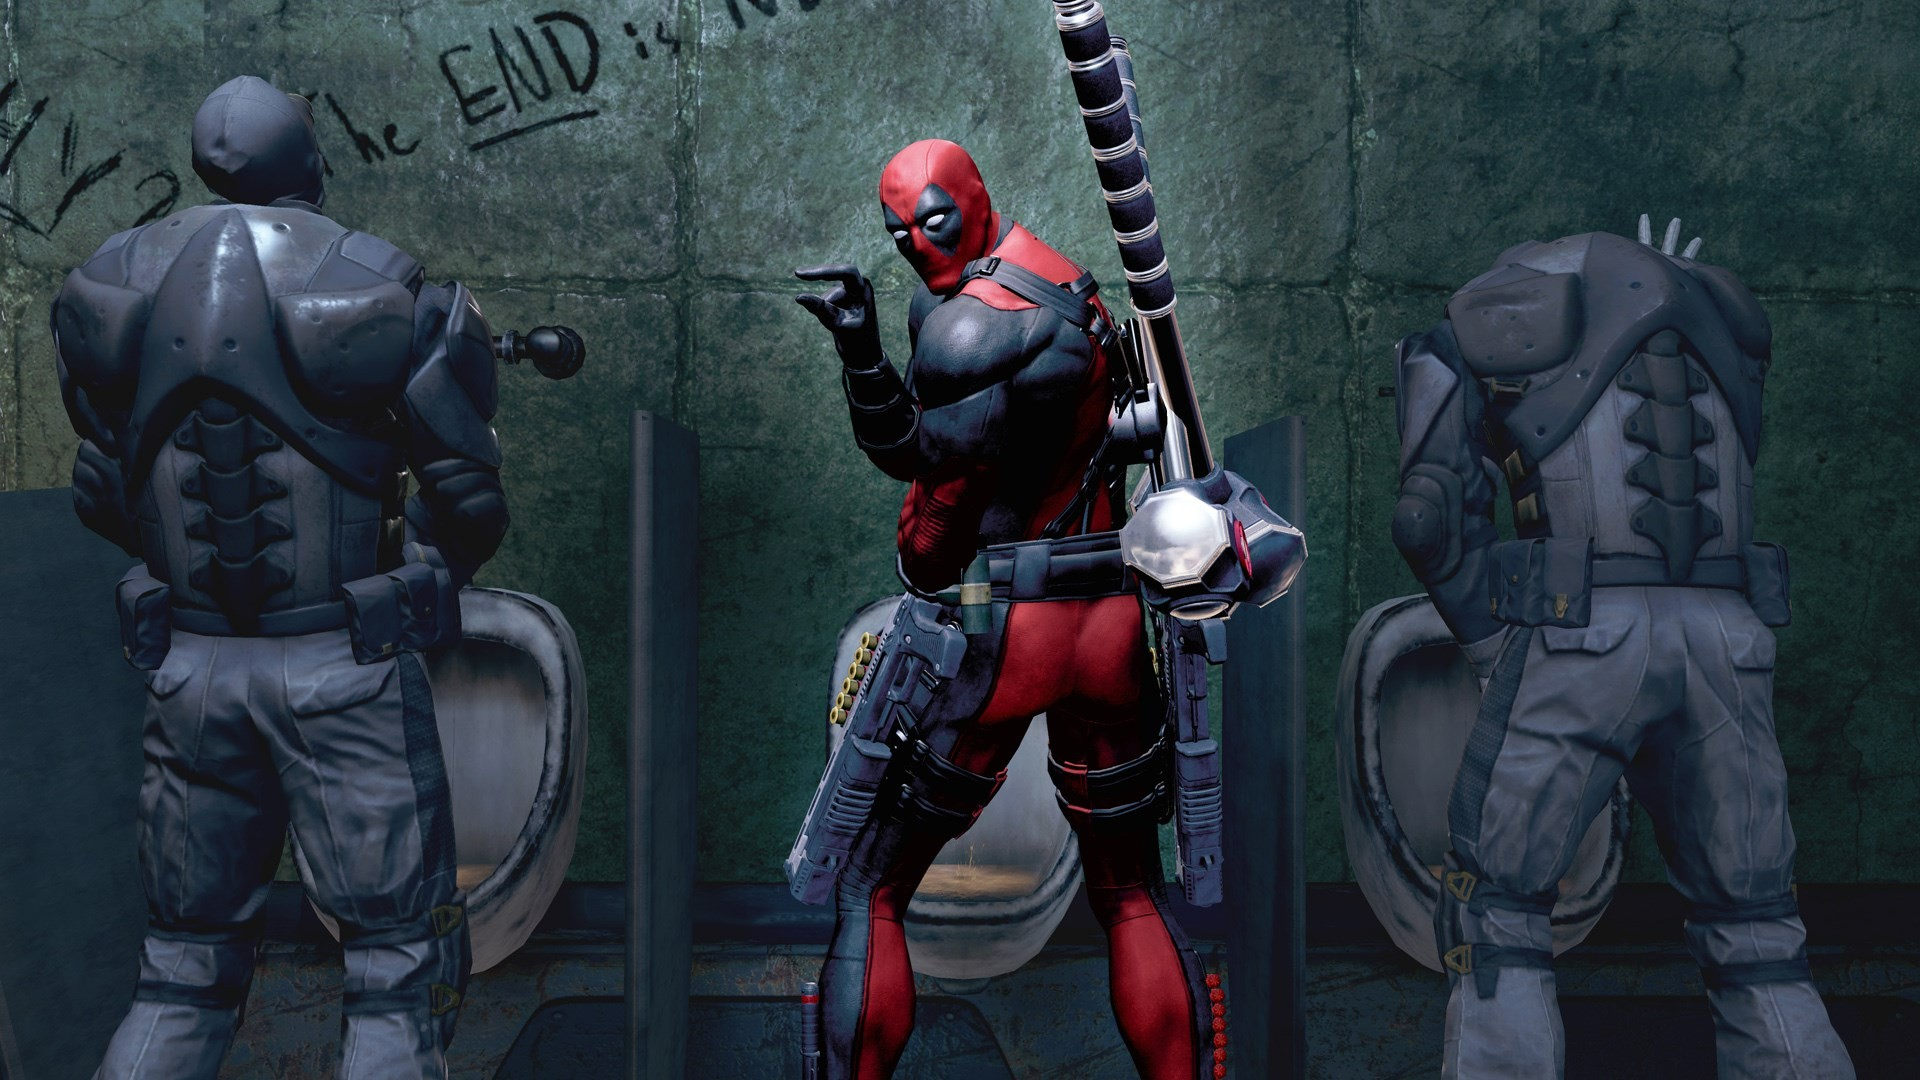 Deadpool Hd Wallpaper ① Download Free Cool Backgrounds For Desktop